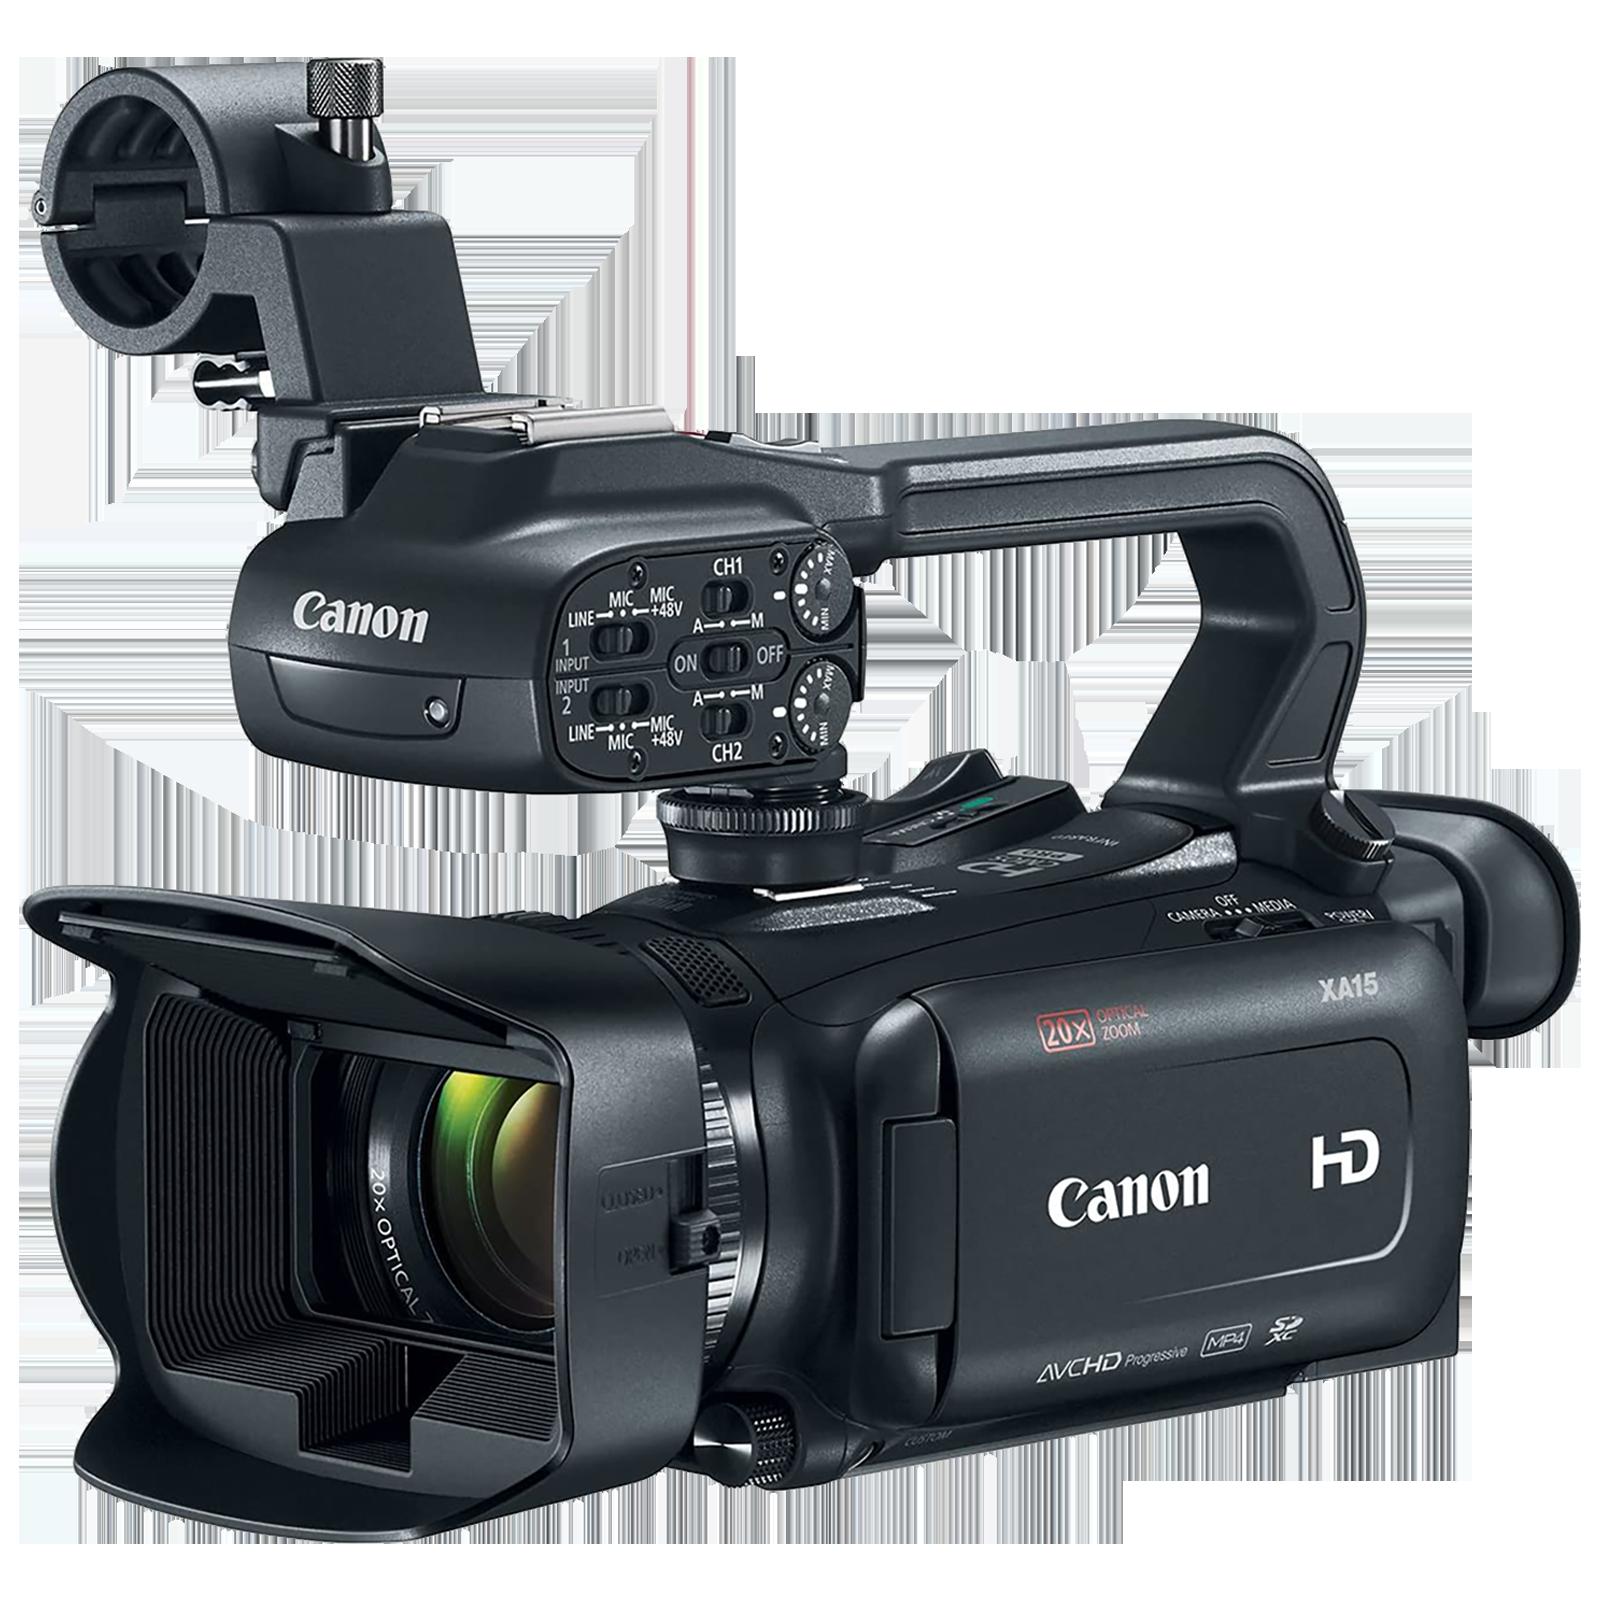 Canon XA15 2.91 MP Camcorder (20x Optical Zoom, Dynamic Image Stabilization, 2217C003-C02, Black)_1